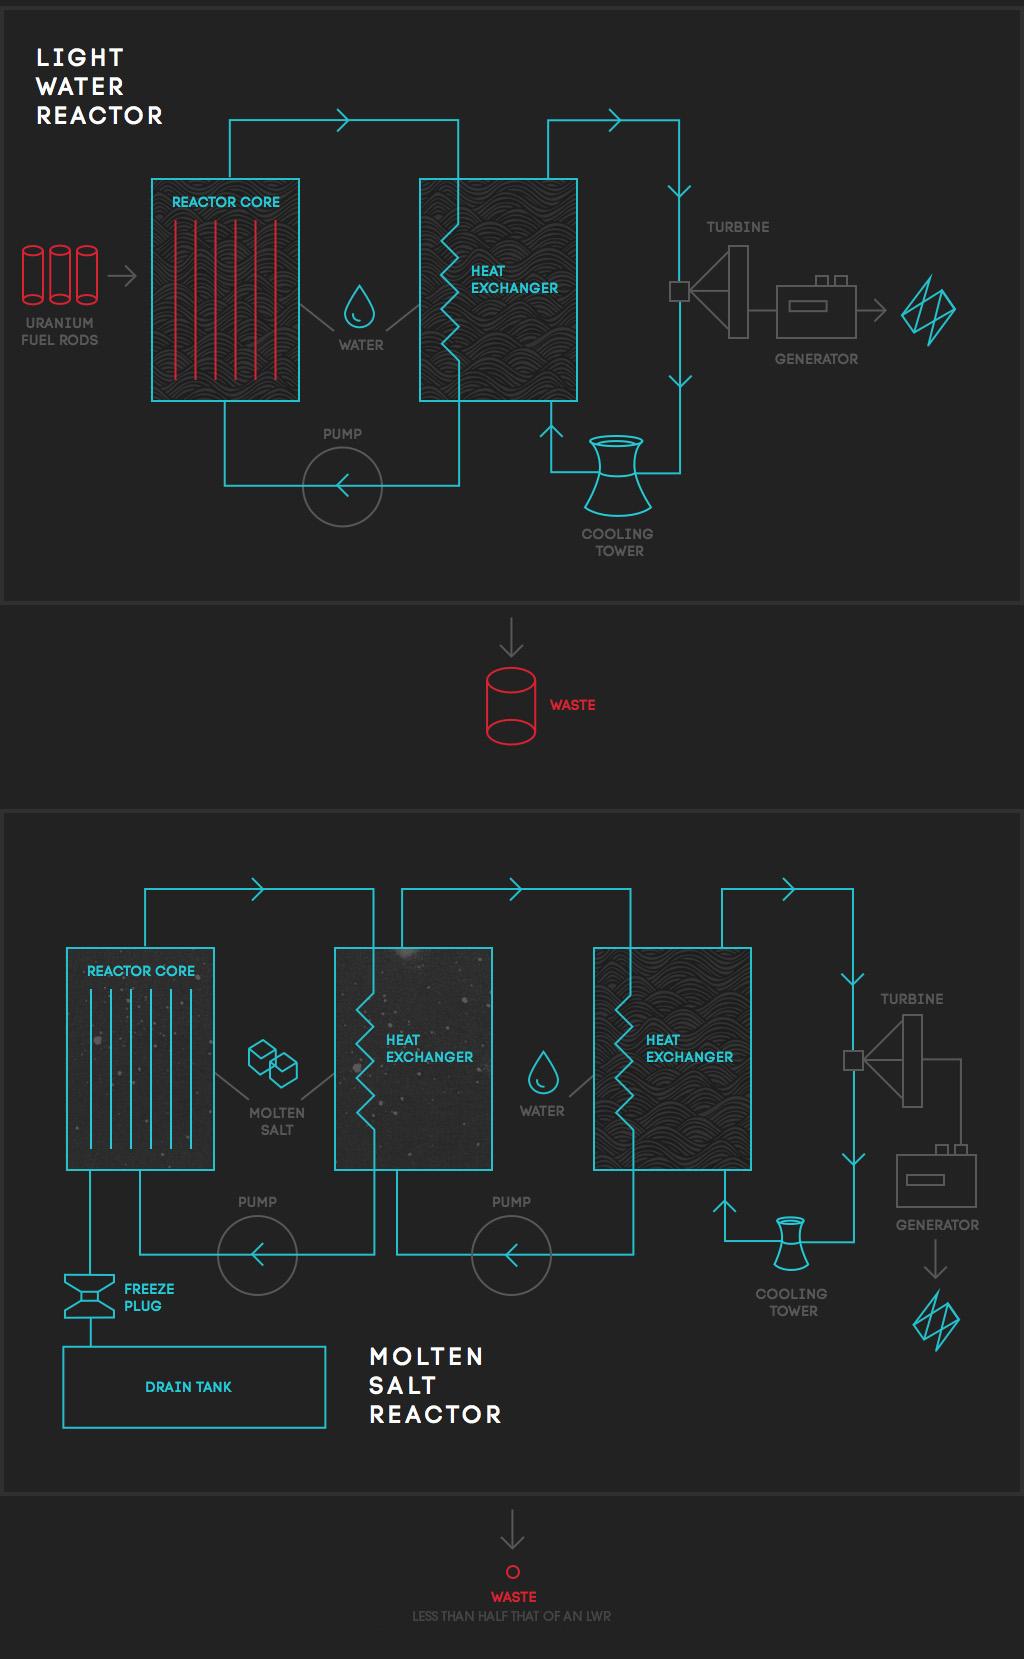 compare-reactors-1